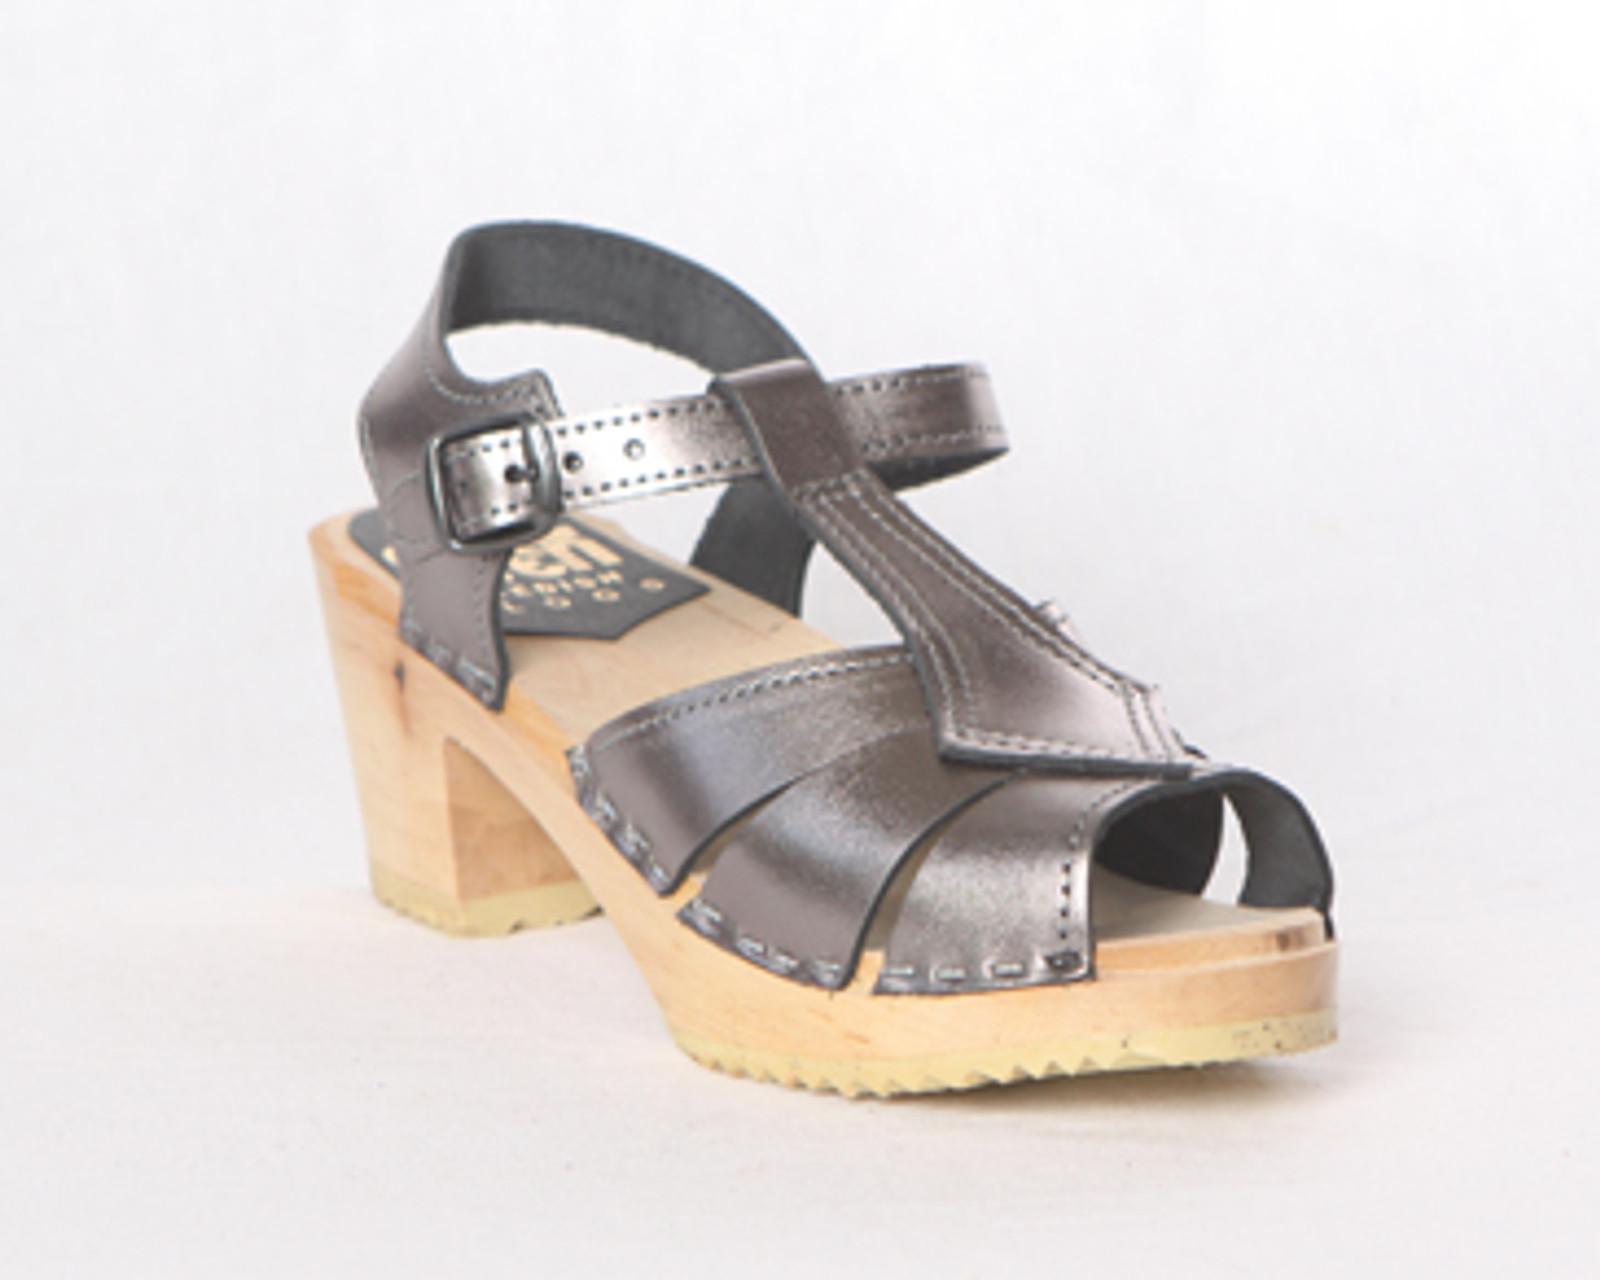 Diamond Strap Clogs  - Mid Heel